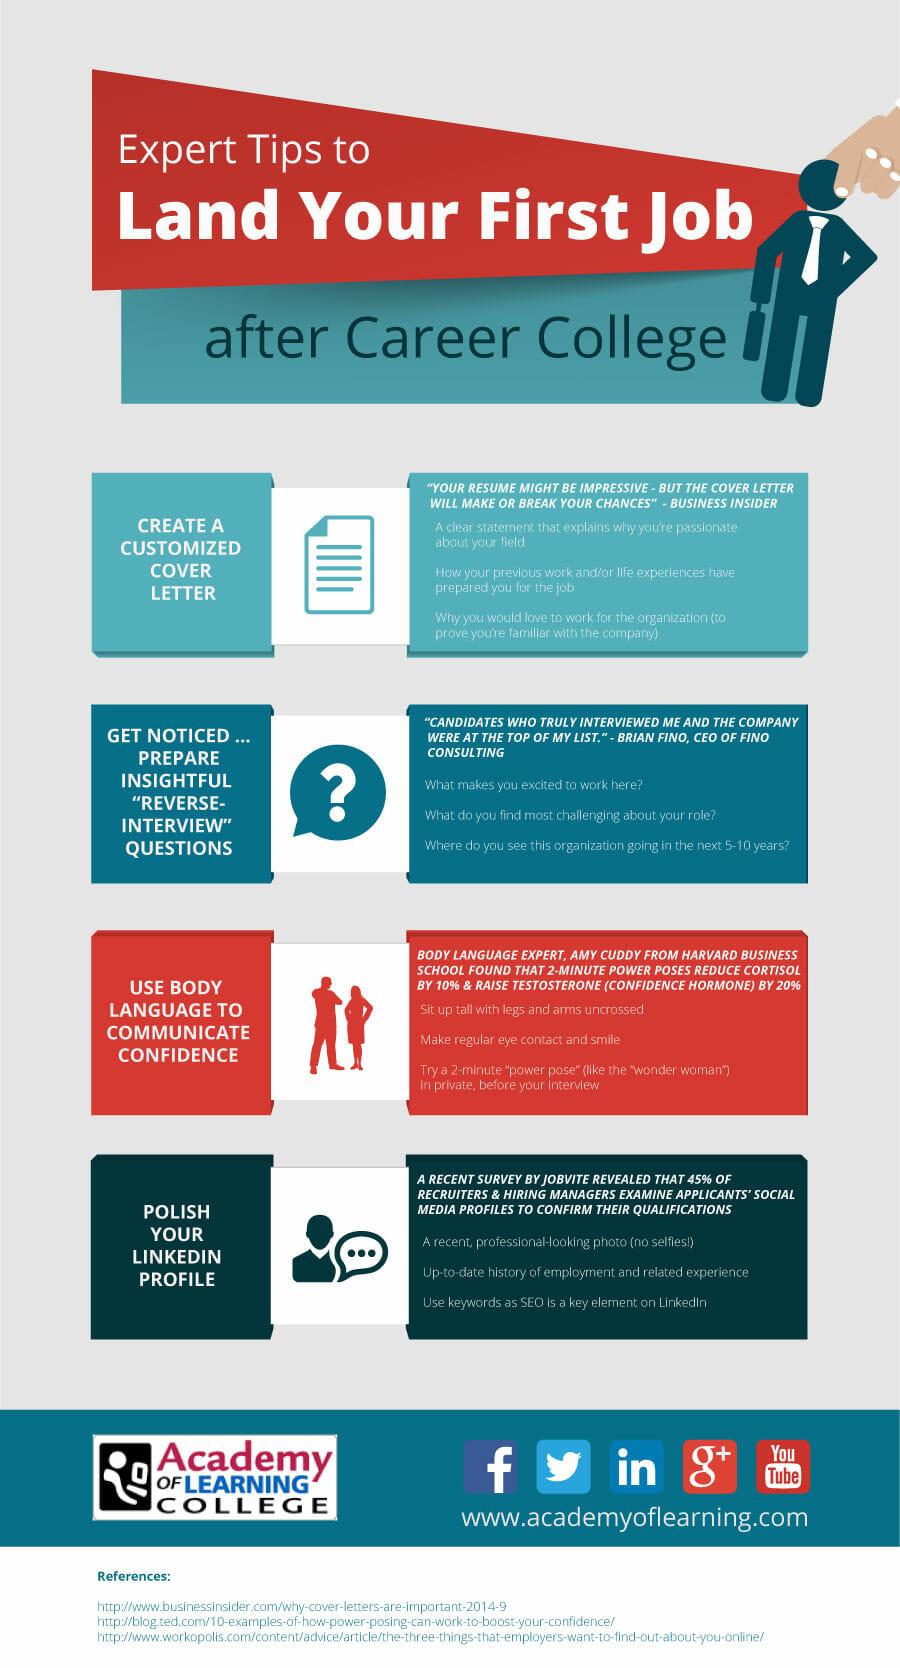 aolc-infographic